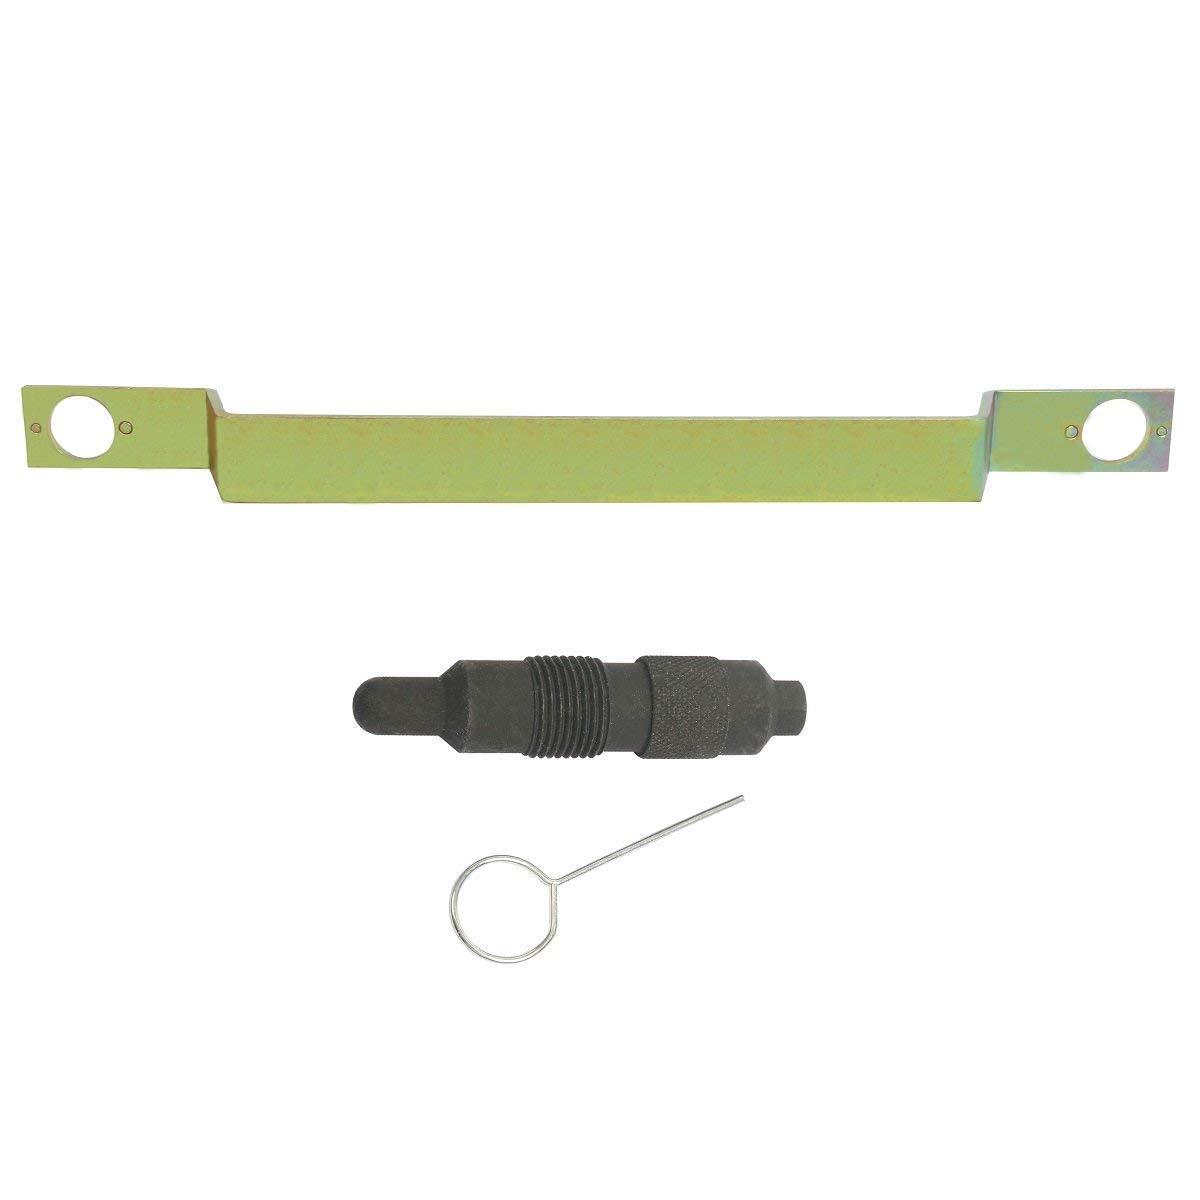 8MILELAKE Camshaft Alignment Engine Cam Timing Locking Holding Tool Kit Compatible for VW Audi V6 S4 A6